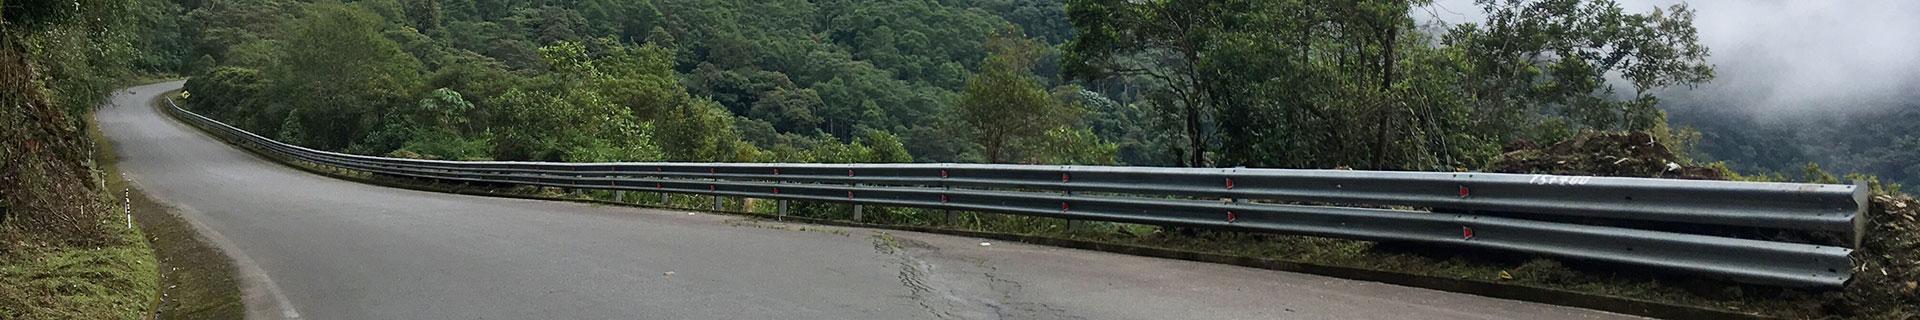 motorradreise-ecuador-slider-03